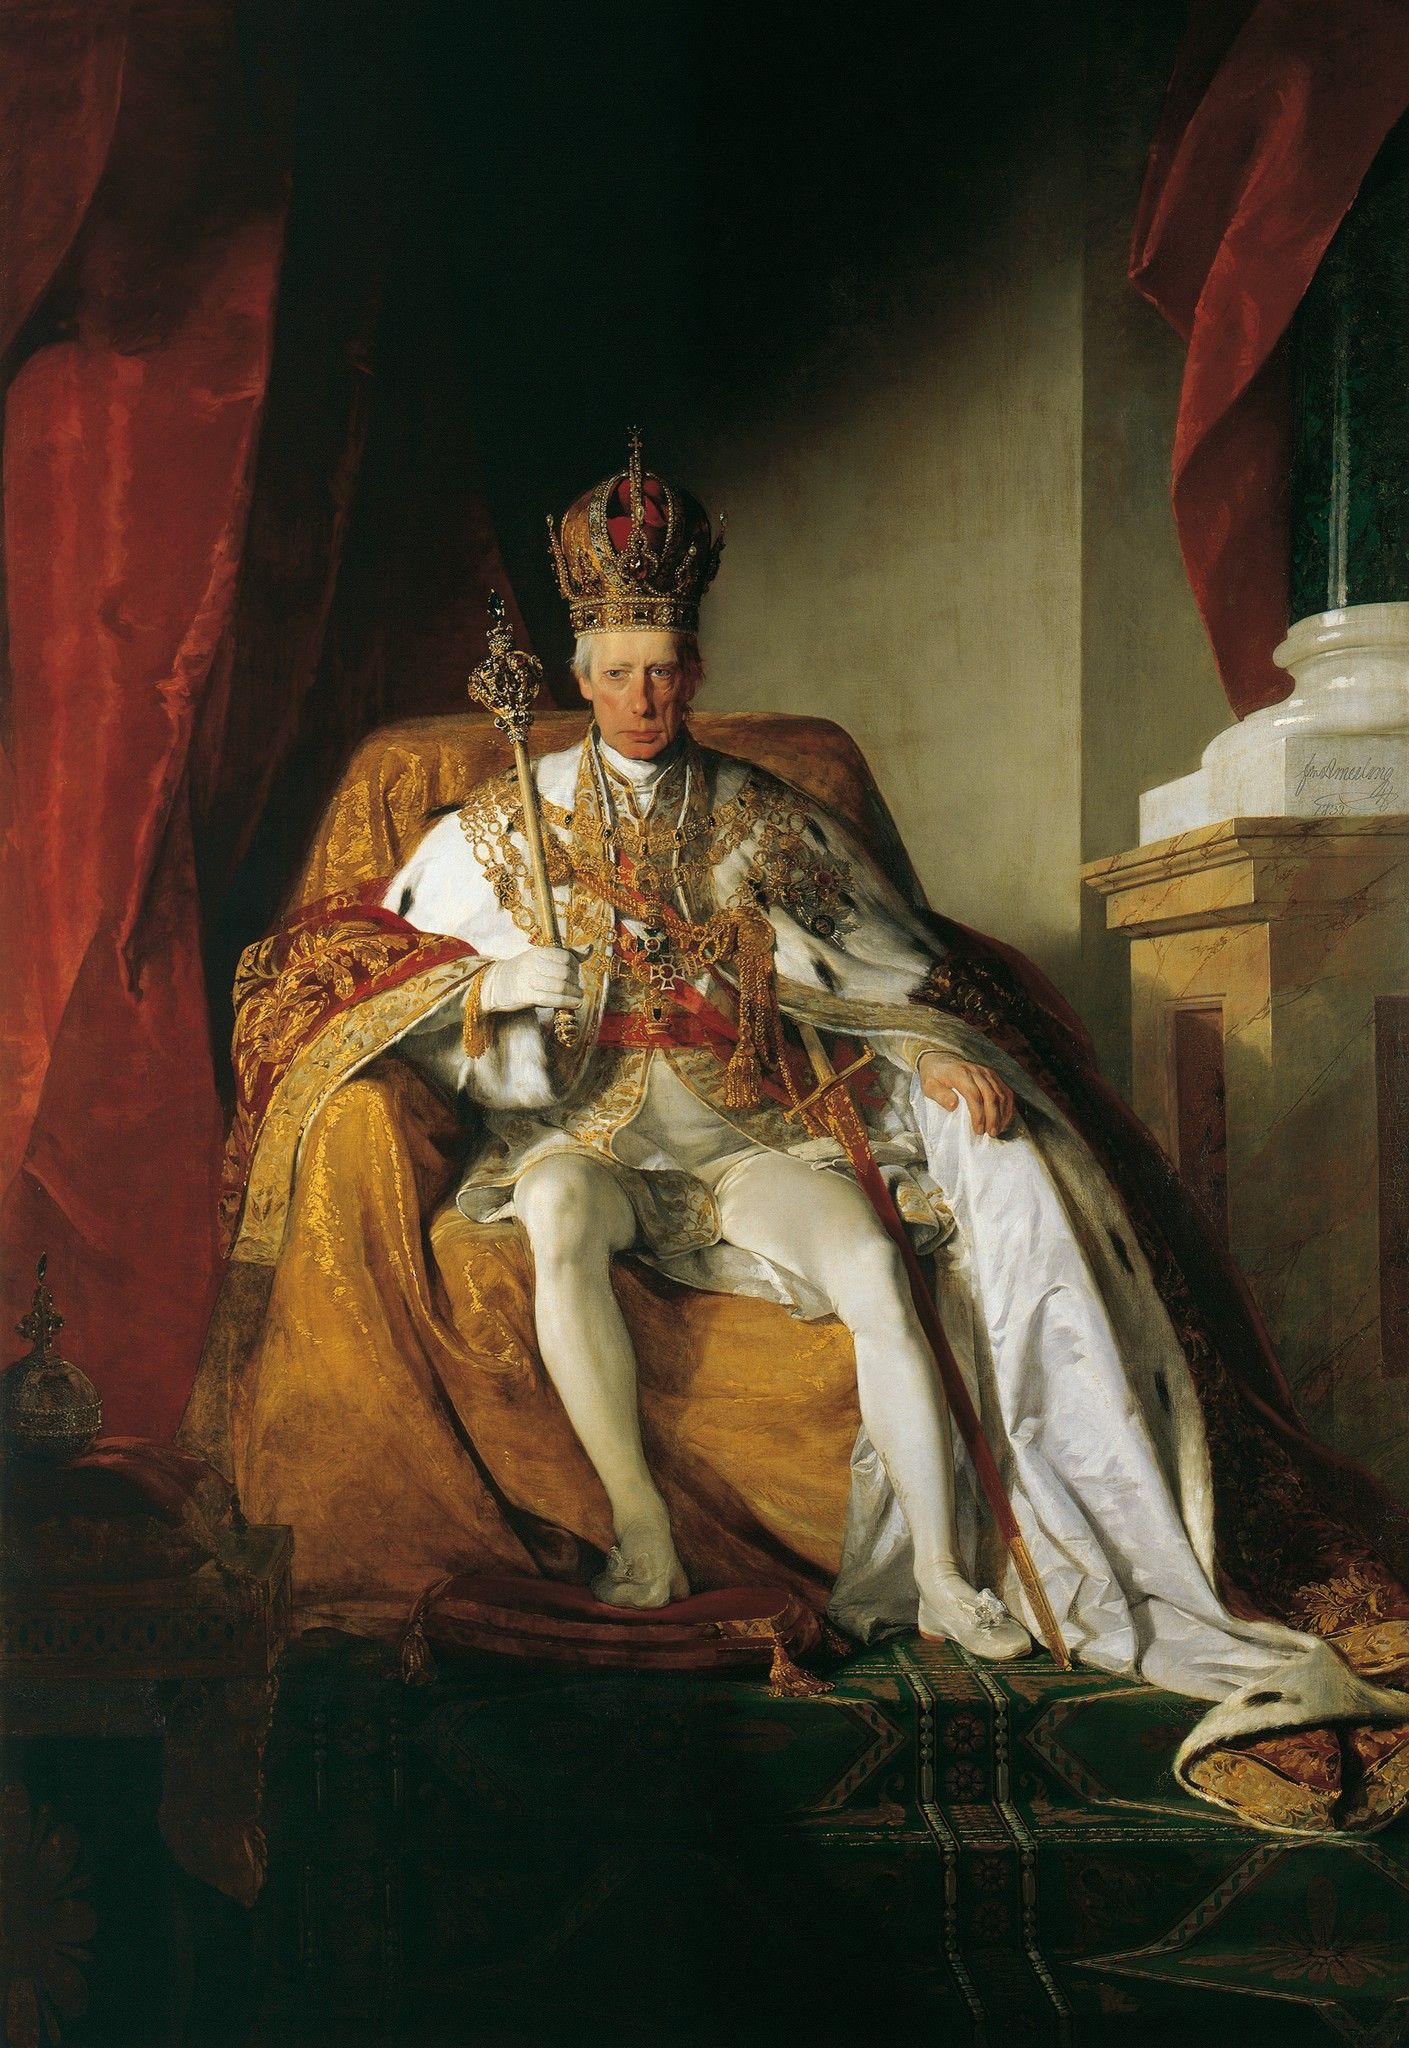 THE LAST HOLY ROMAN EMPIRE EMPEROR FRANCIS II 2 PAINTING ROME ART CANVAS PRINT